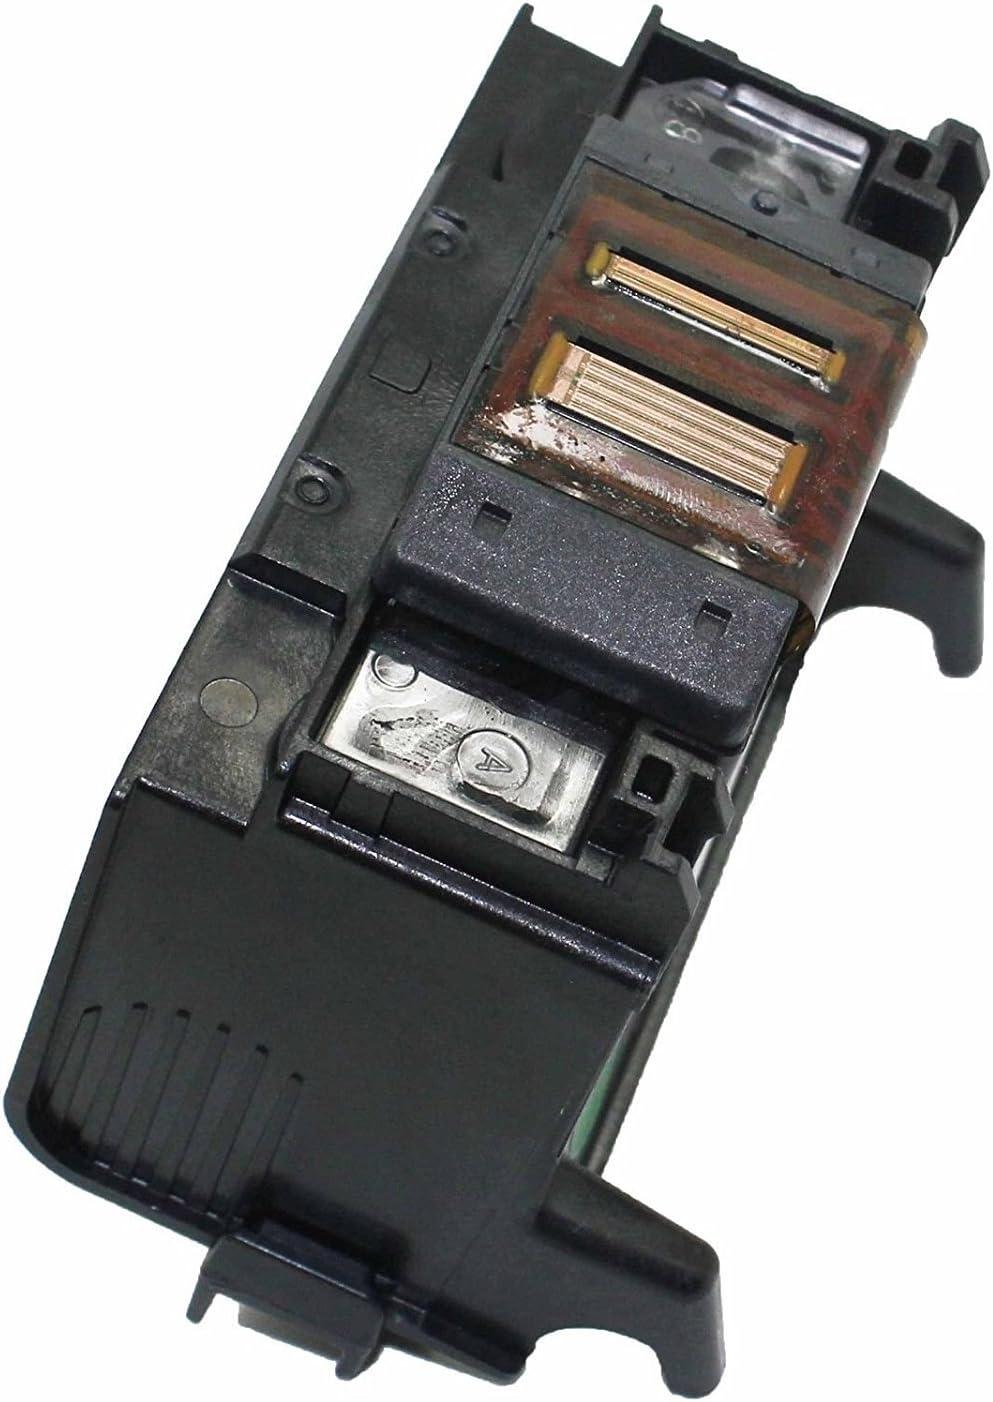 1x 4-Slot Printhead LiC-Store Compatible 178 364 564 862 564XL 4-Slot Printhead Print Head for HP 5520 6520 7510 7520 3520 4610 C5388 C6388 D5468 C410d B111g B210A C410d